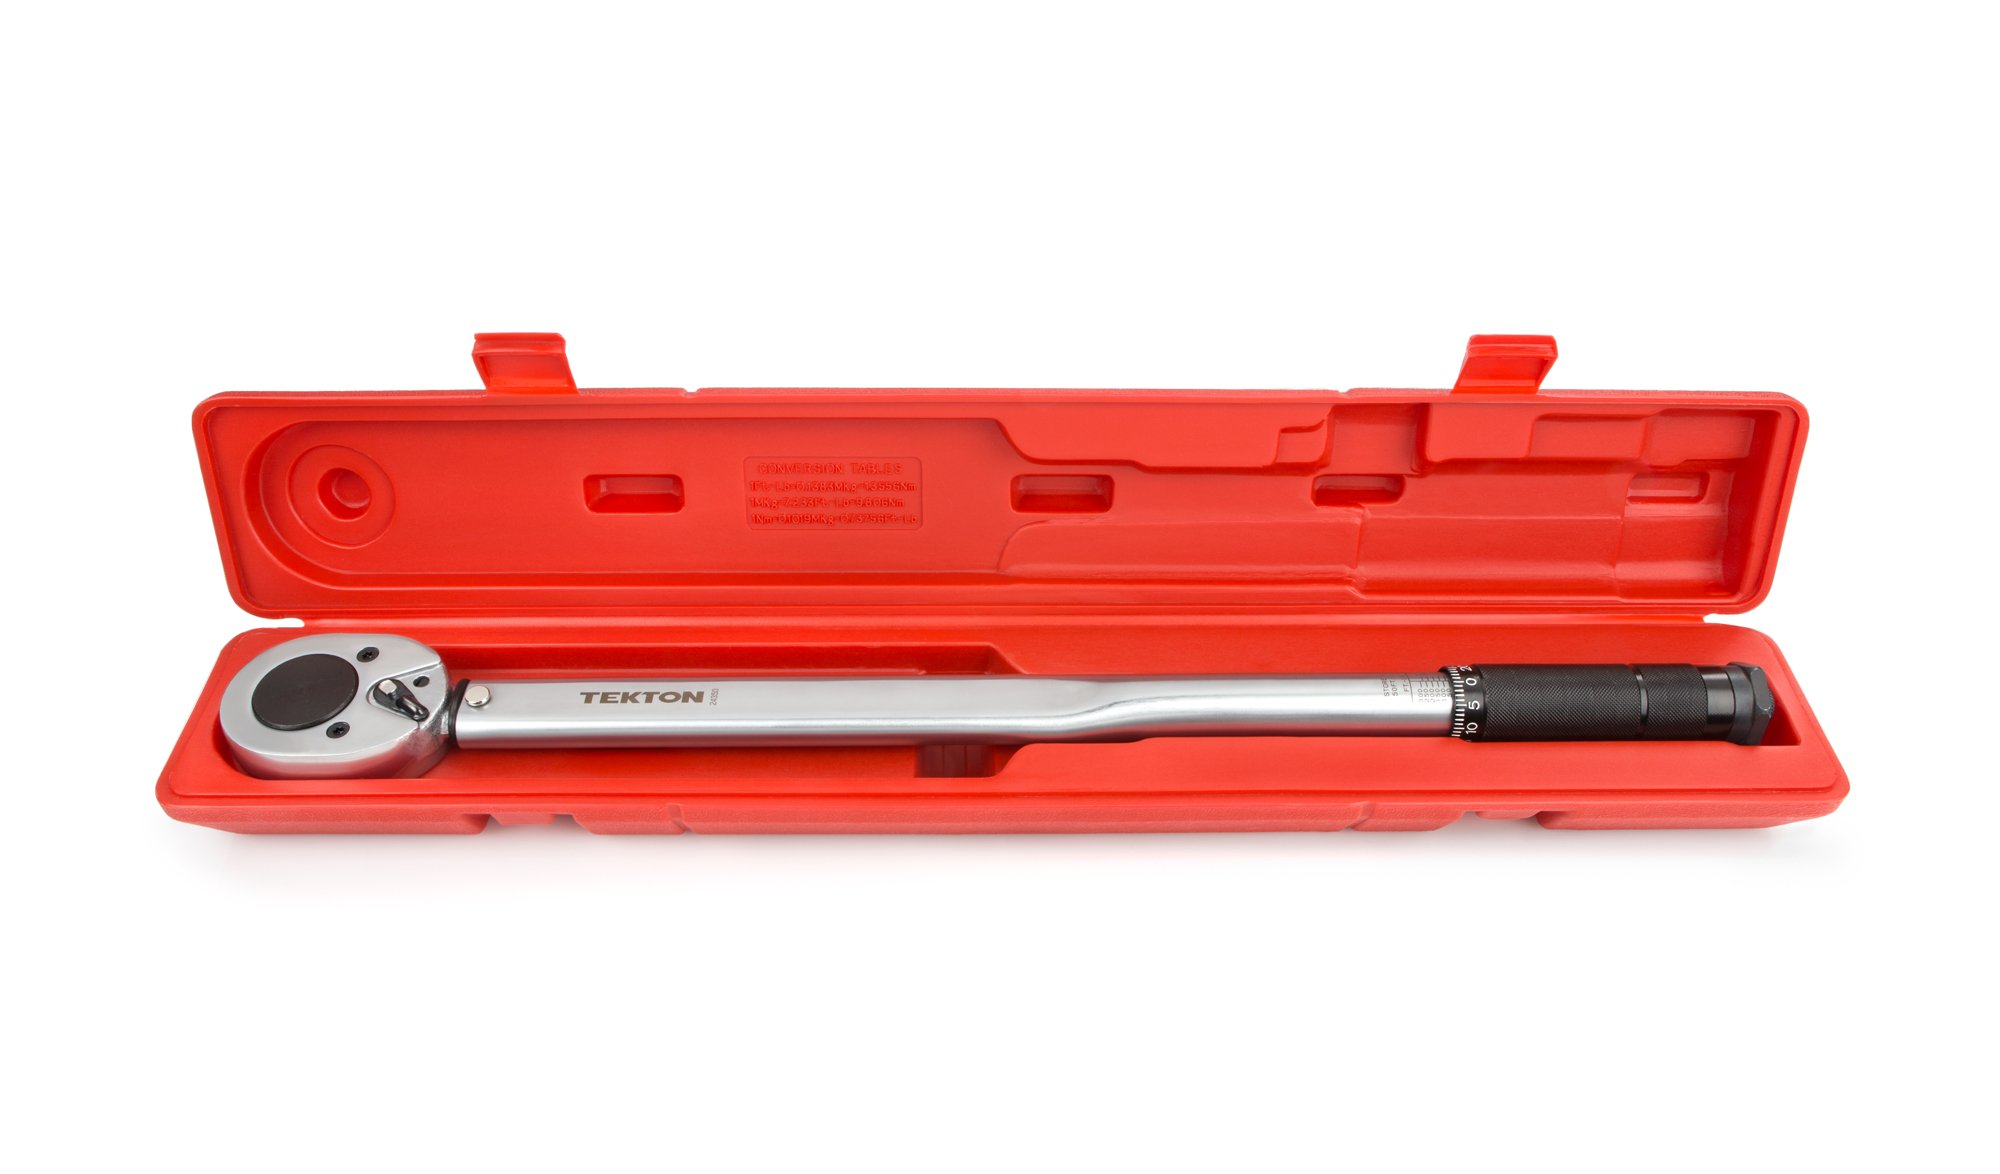 TEKTON 24350 3/4-Inch Drive Click Torque Wrench (50-300 ft.-lb./67.8-406.7 Nm) by TEKTON (Image #2)